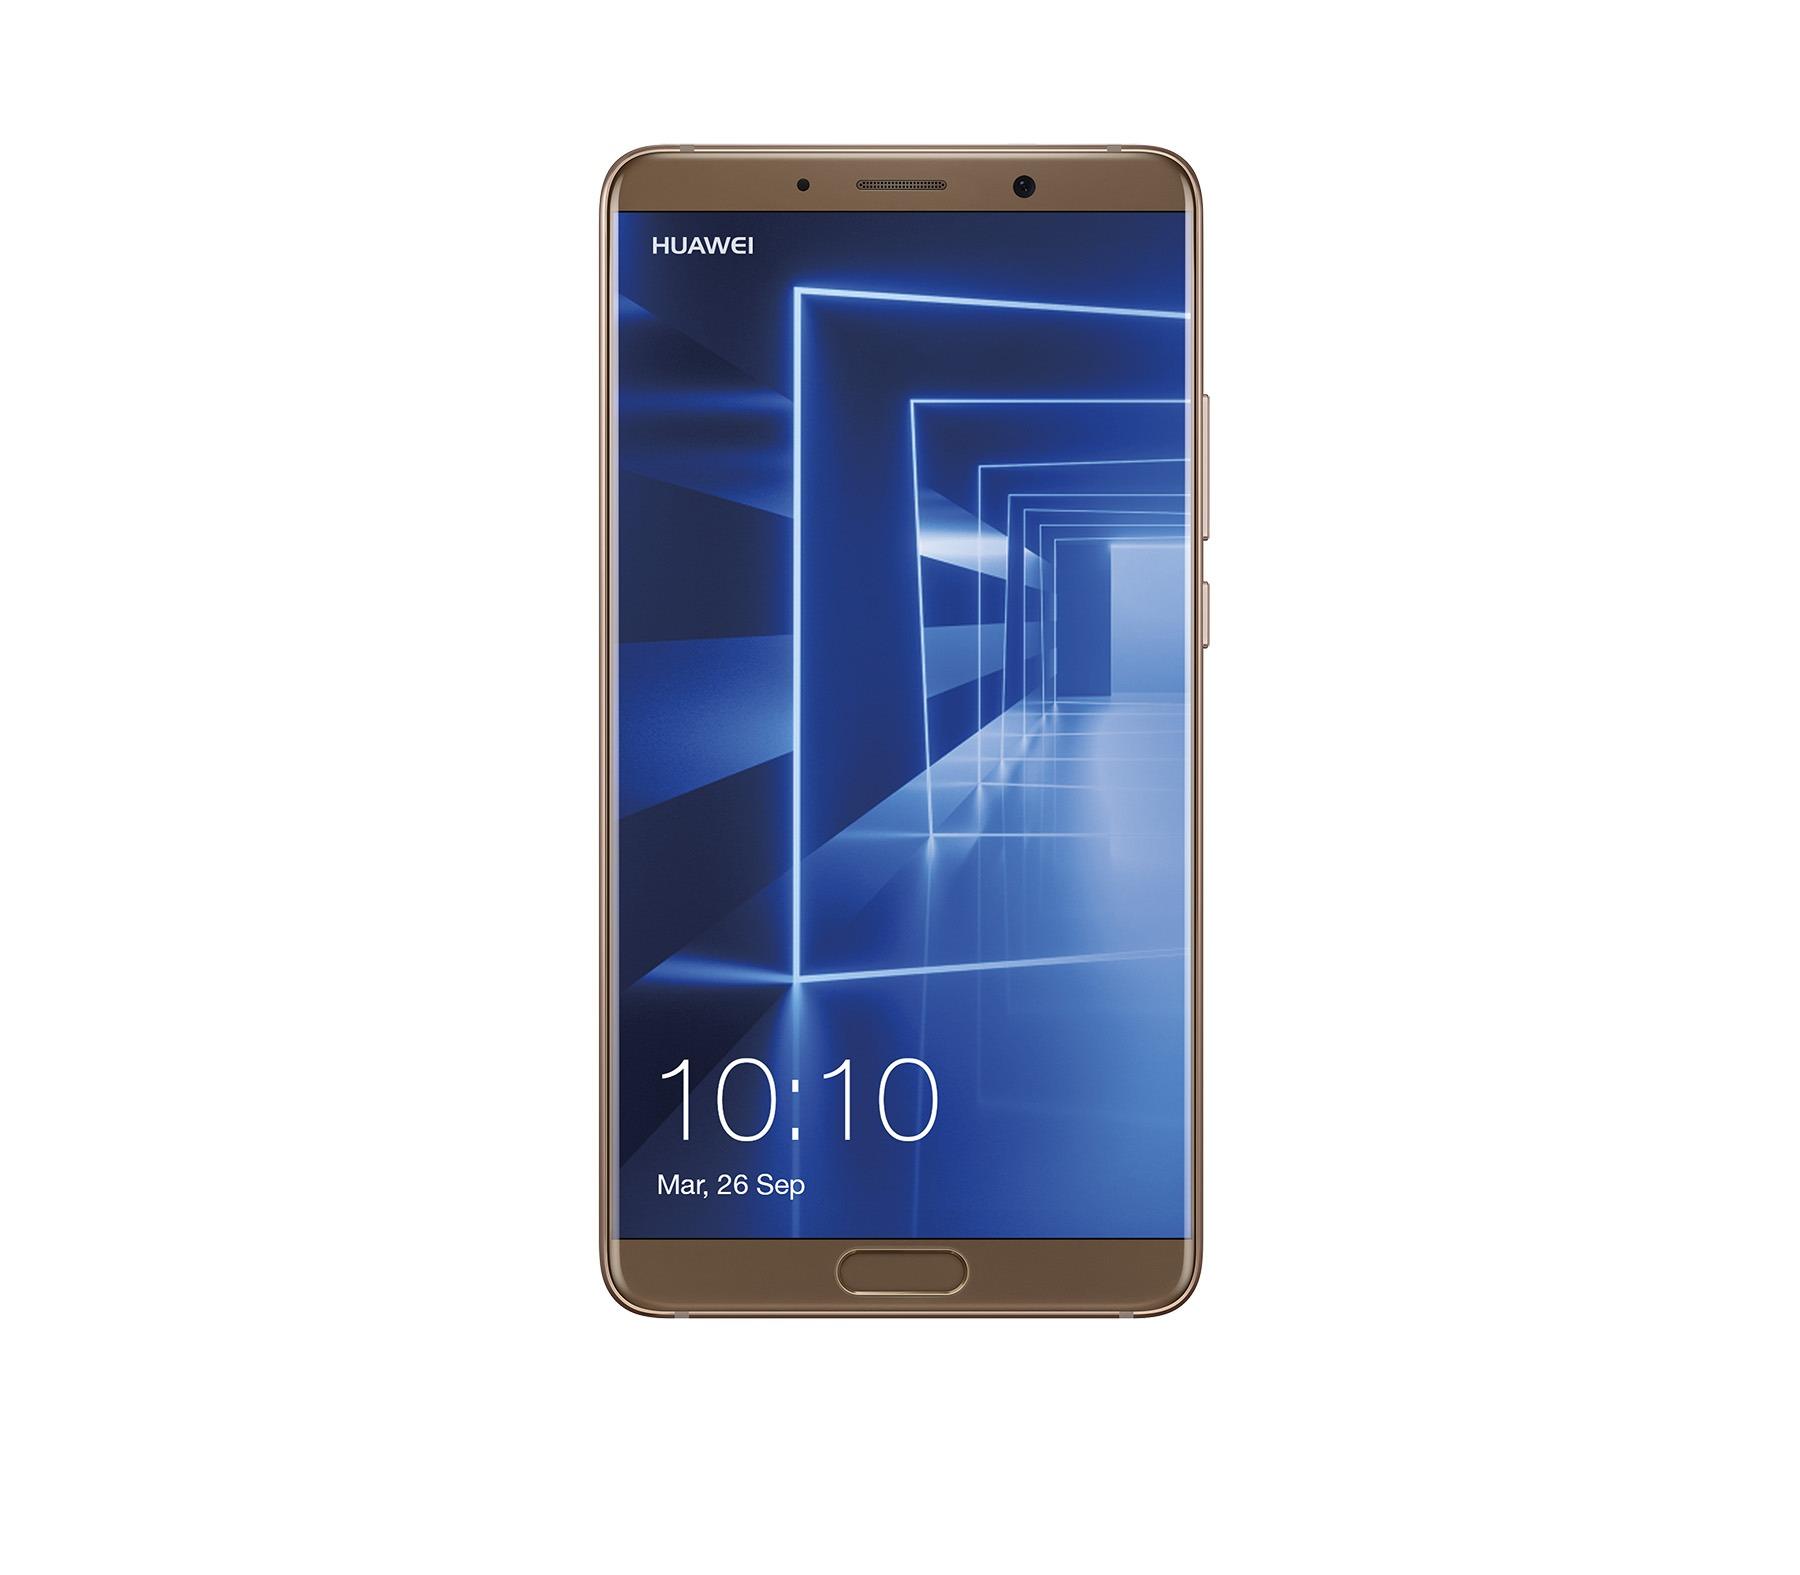 Las 5 claves del Huawei Mate 10